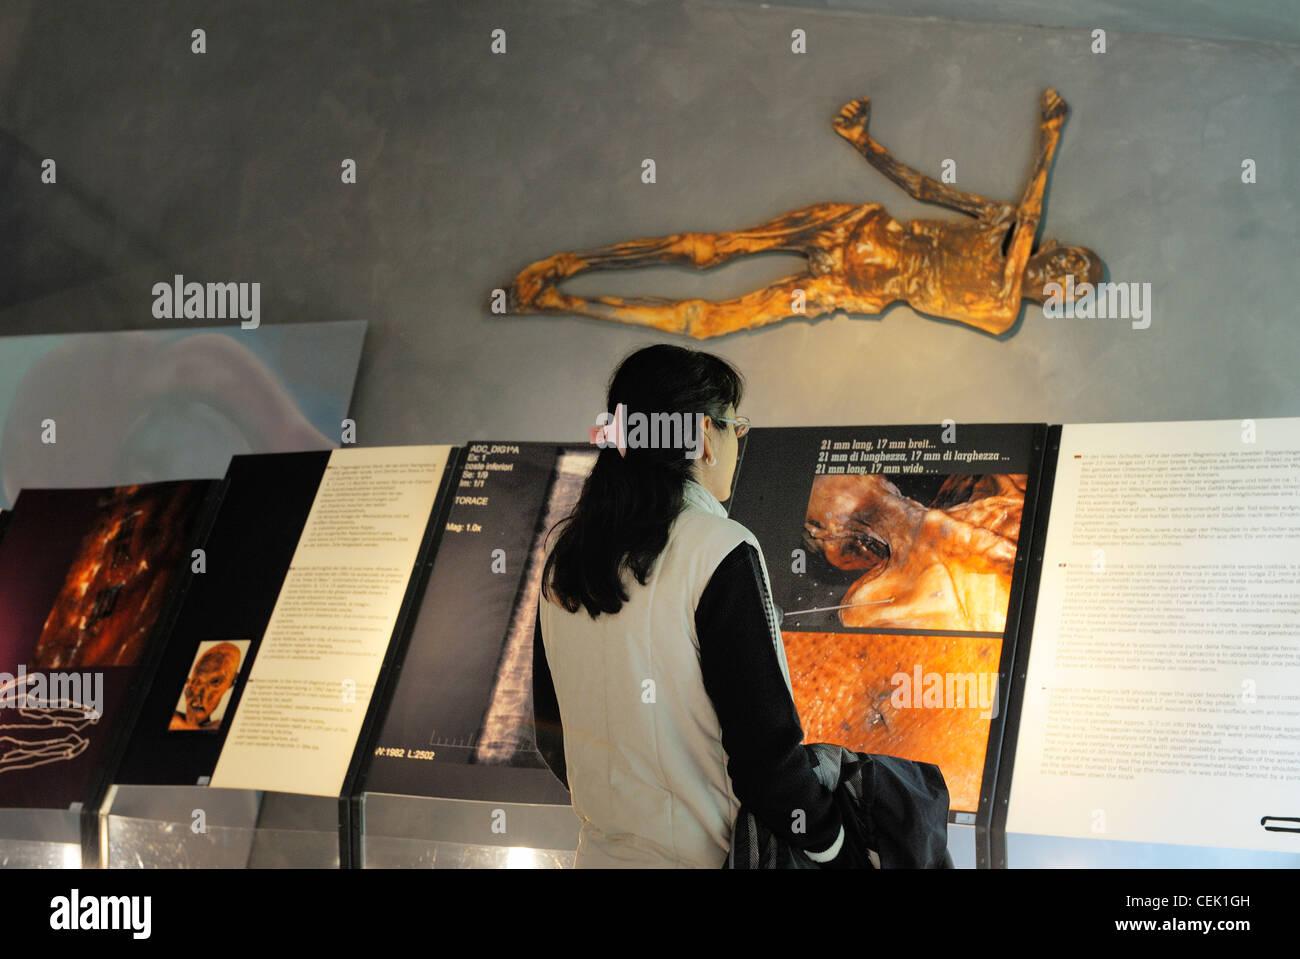 Archeoparc in Schnals village near Bolzano, Italy tells story of Otzi. Alpine prehistoric iceman found frozen in - Stock Image